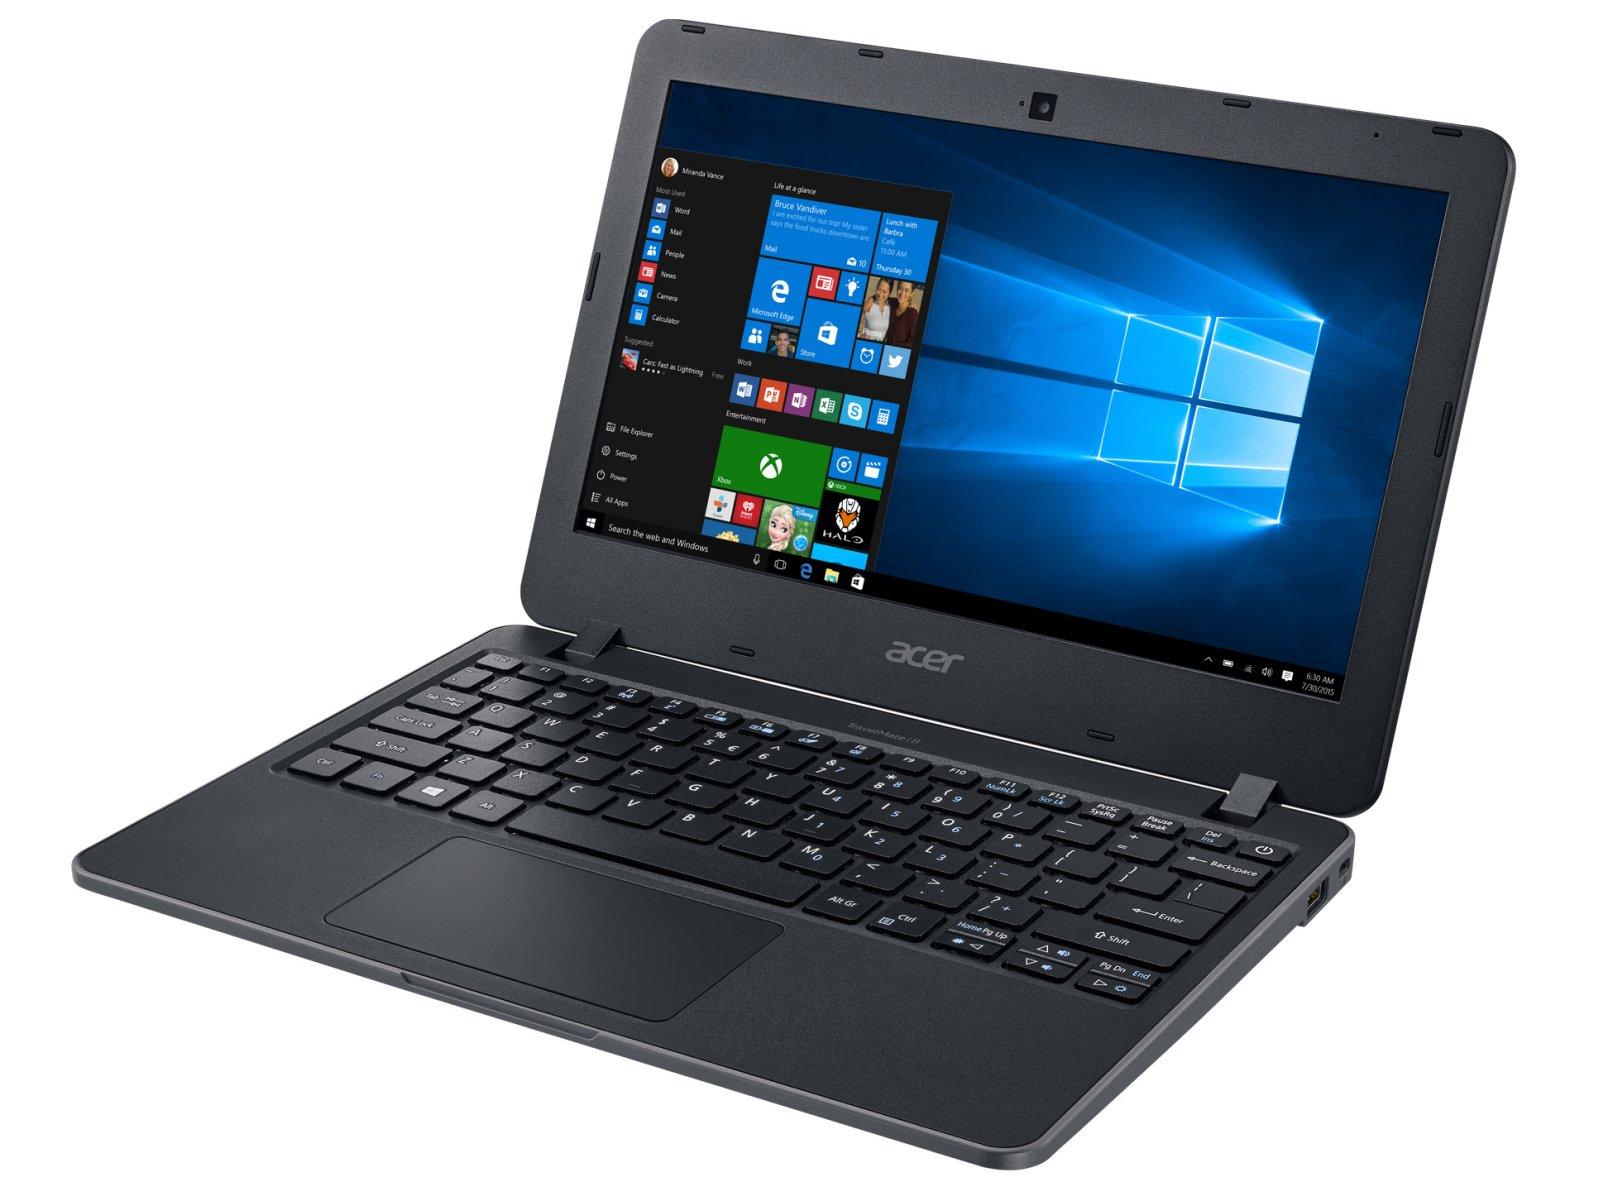 Acer Travelmate B (TMB117-MP-C2G3) Celeron N3060 DC 1.6GHz 4GB 32GB 11.6'' Touch Screen Windows 10 Pro